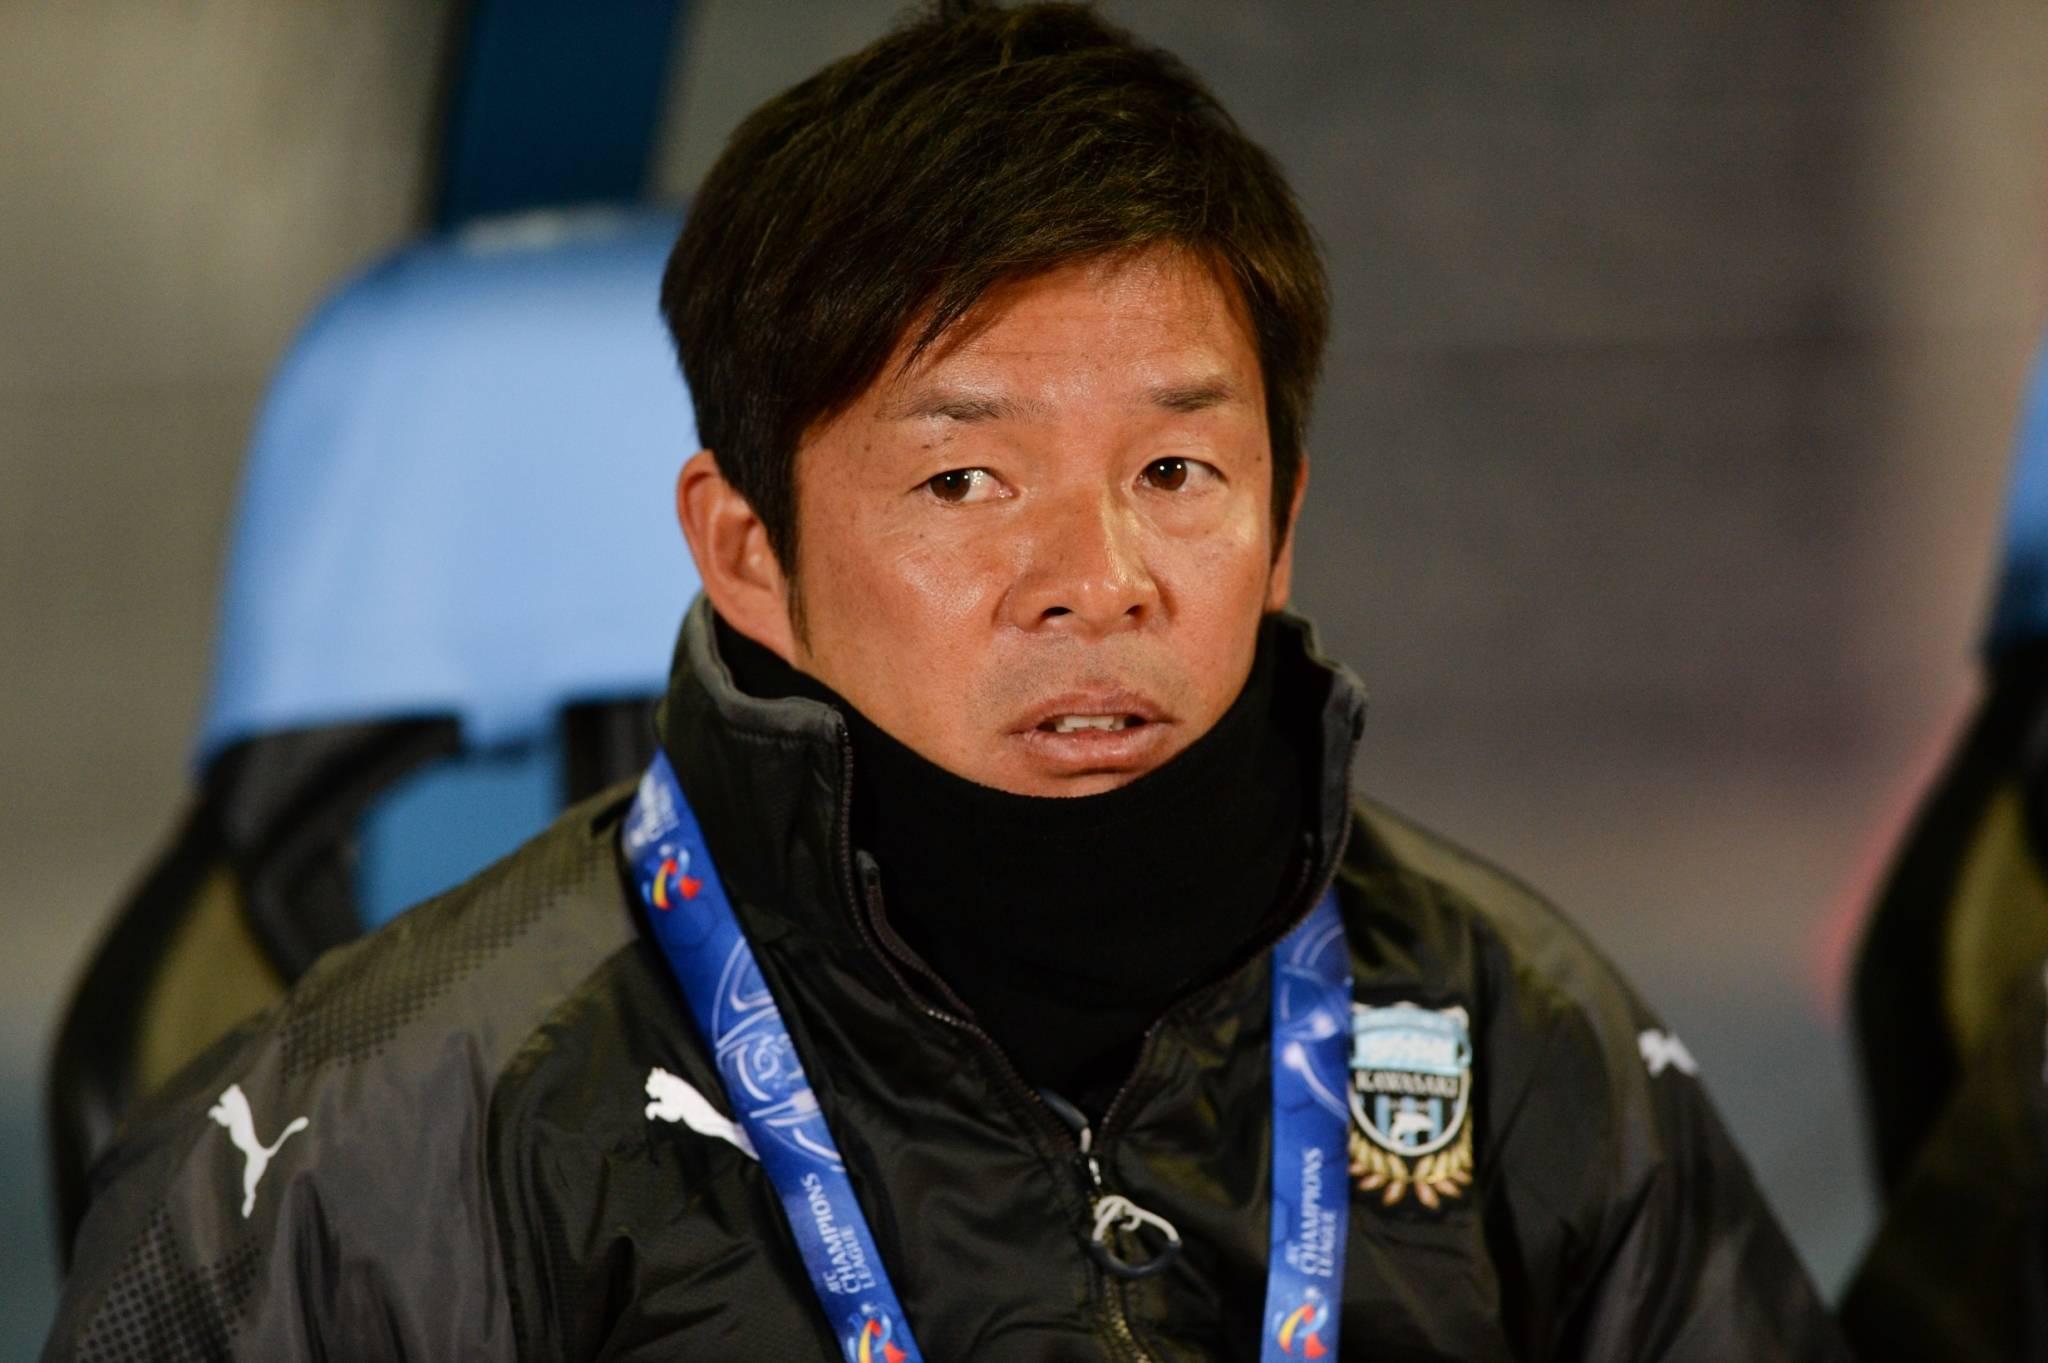 J1王者川崎フロンターレ、鬼木達監督の続投を発表!4年間で6つのタイトル獲得